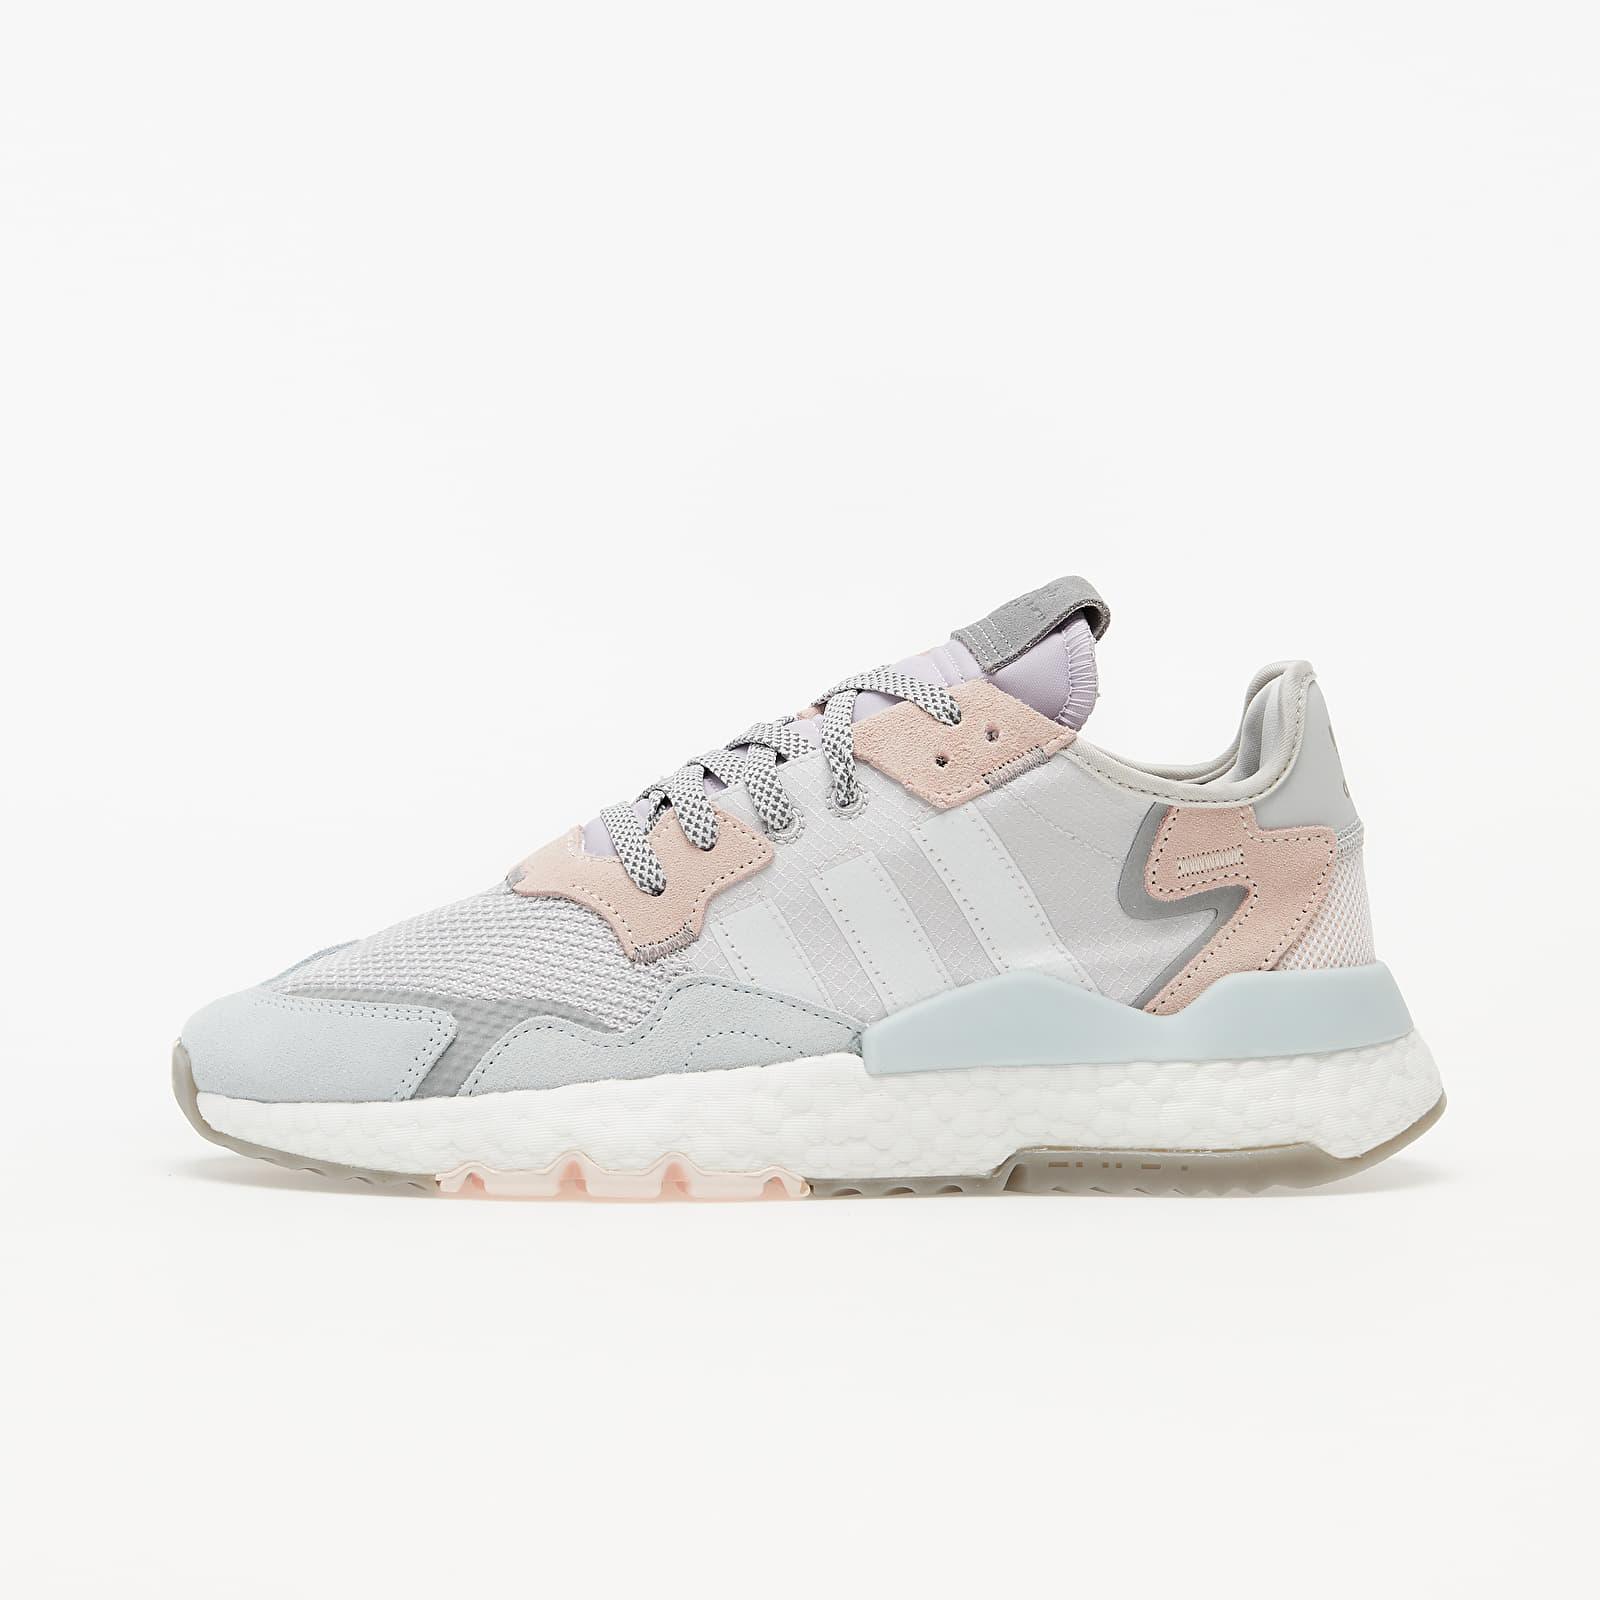 adidas Nite Jogger W Grey One/ Ftw White/ Pink Tint FV1328